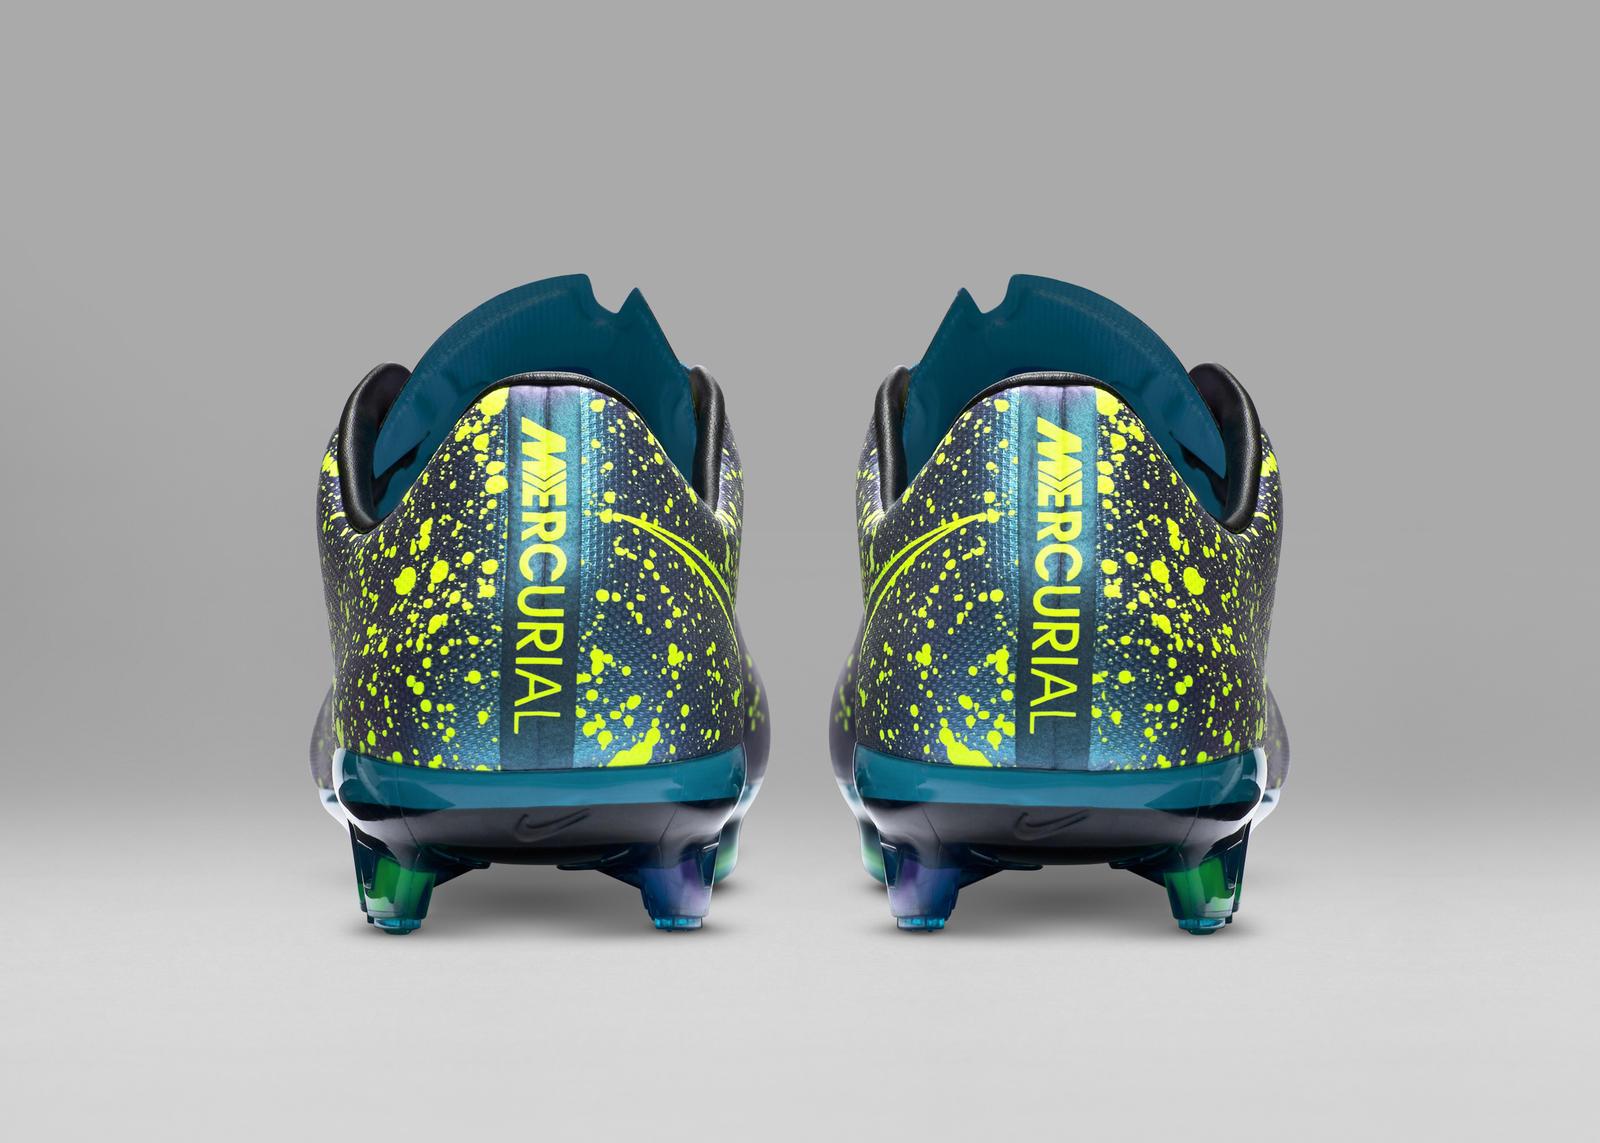 Nike Football Soccer Electro Flare Mercurial Vapor F Prem